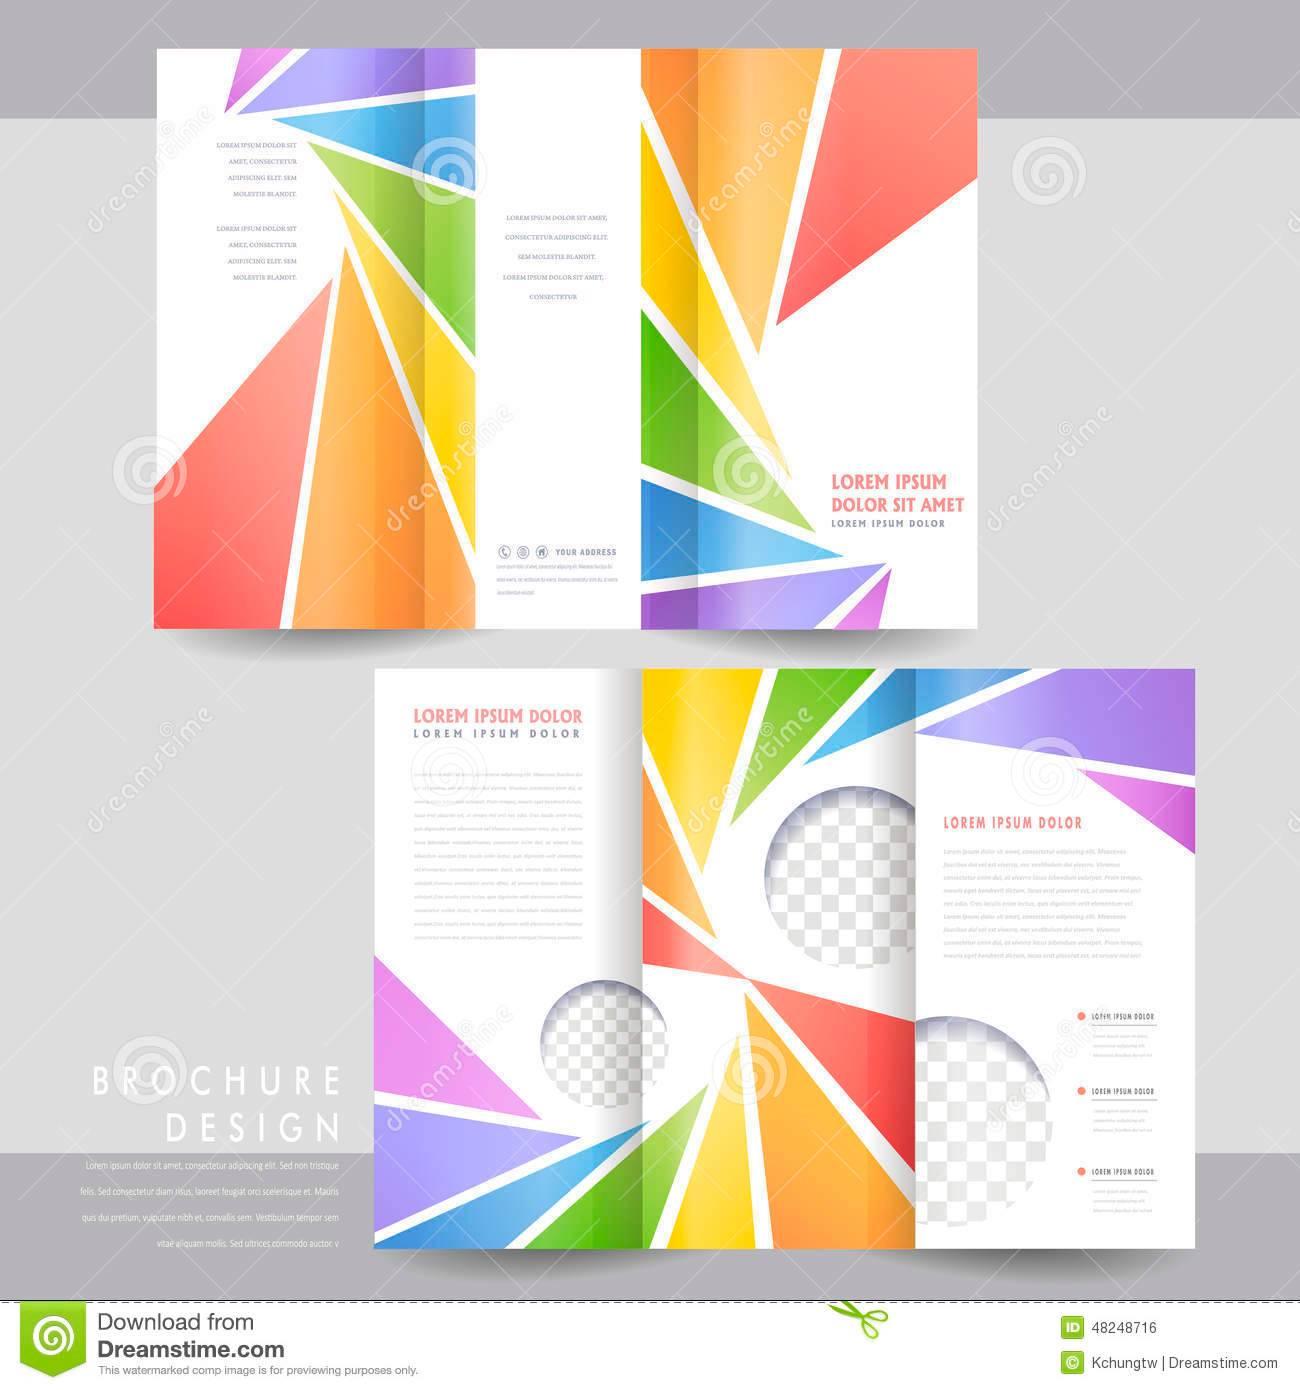 Triangular Folding Brochure Template Download